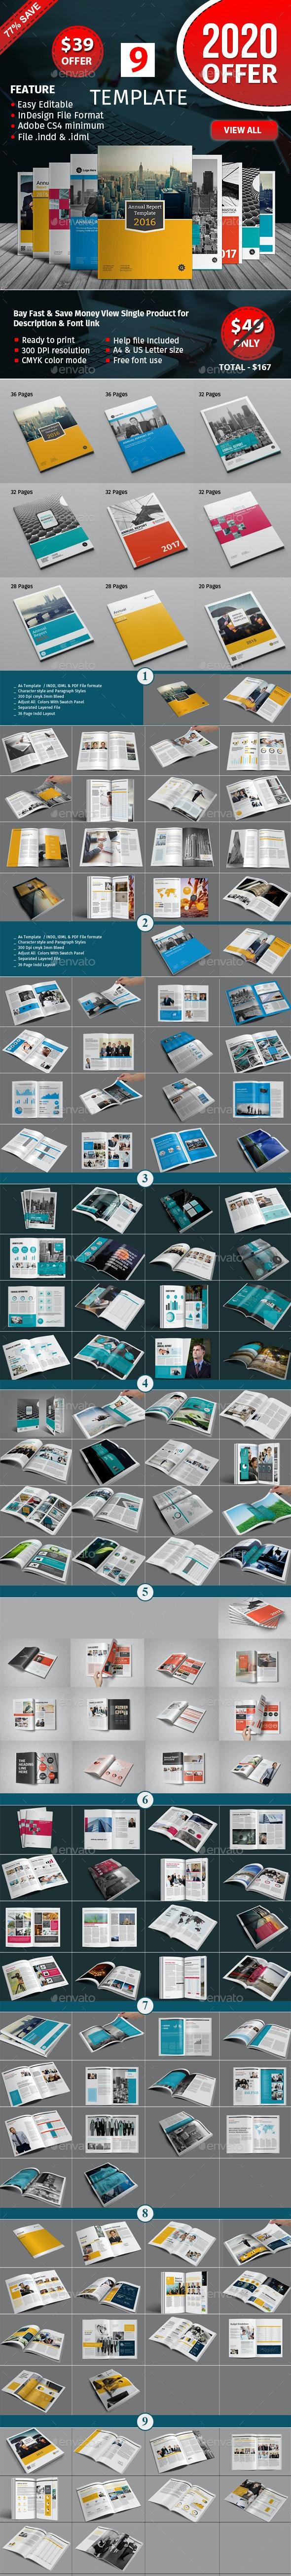 Annual Report Template Bundle - Informational Brochures